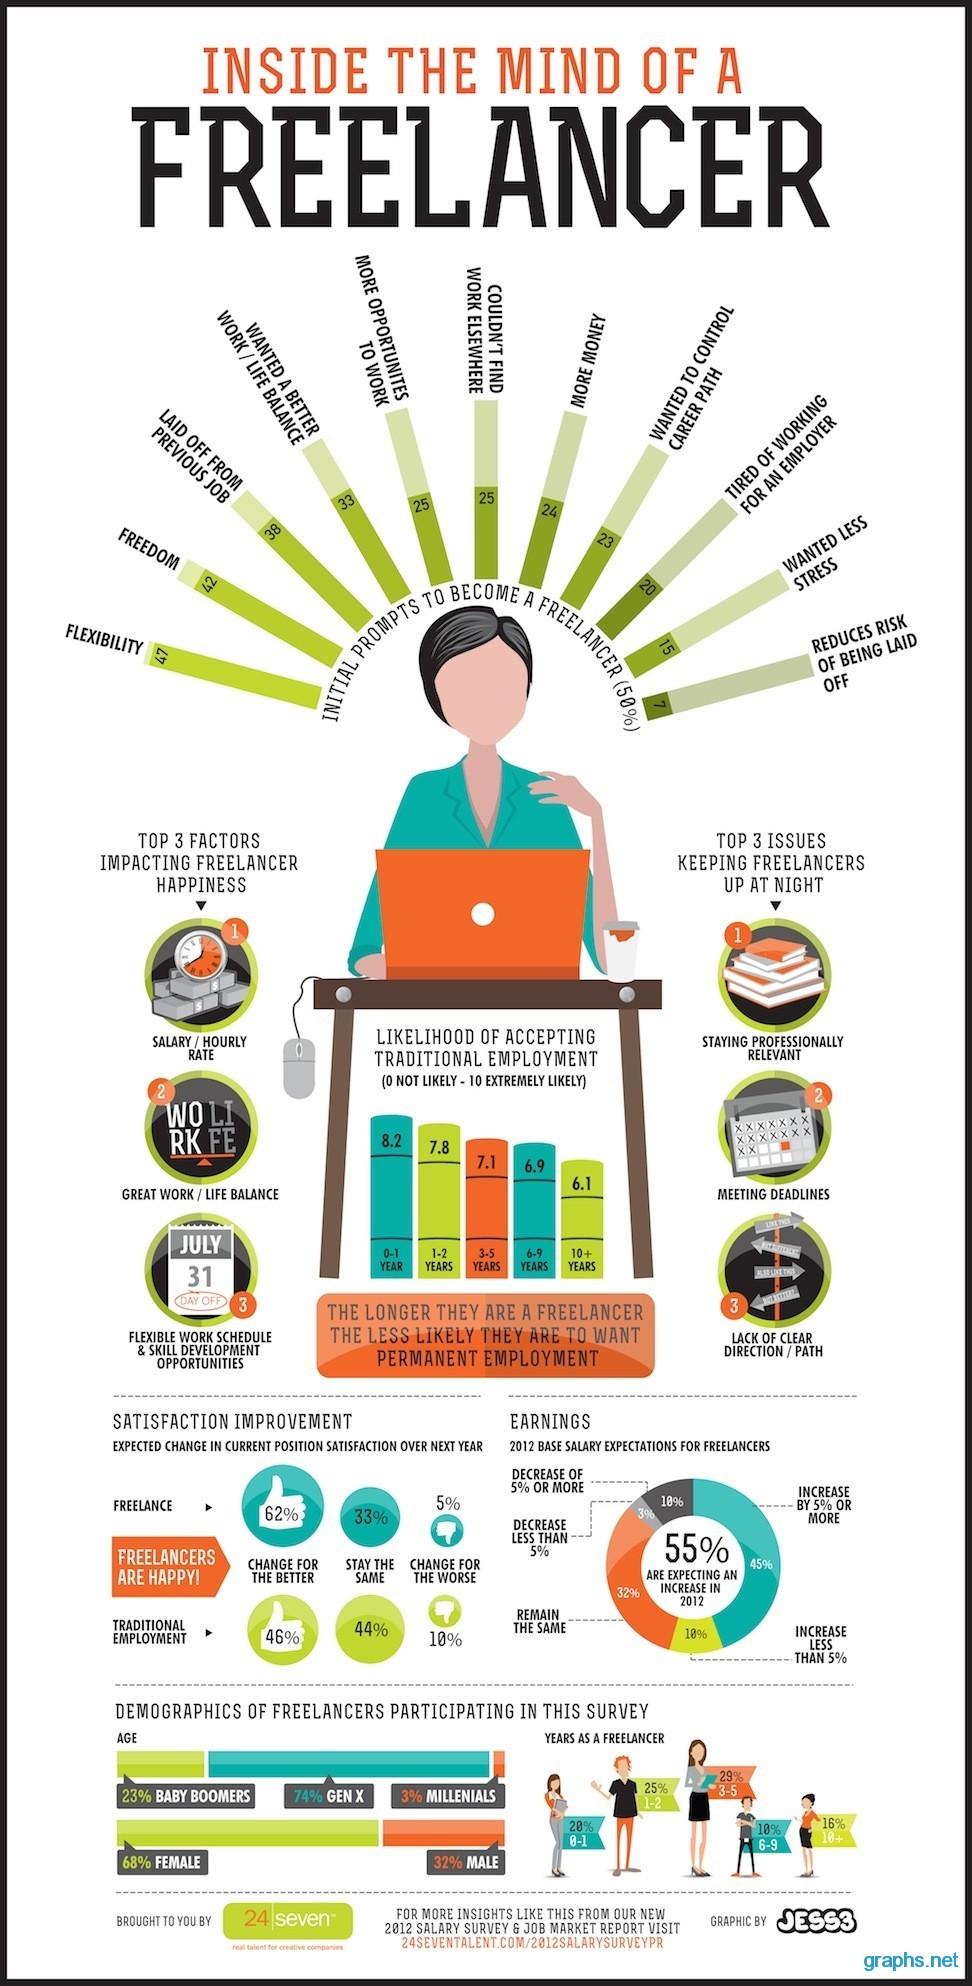 freelance work performing guide